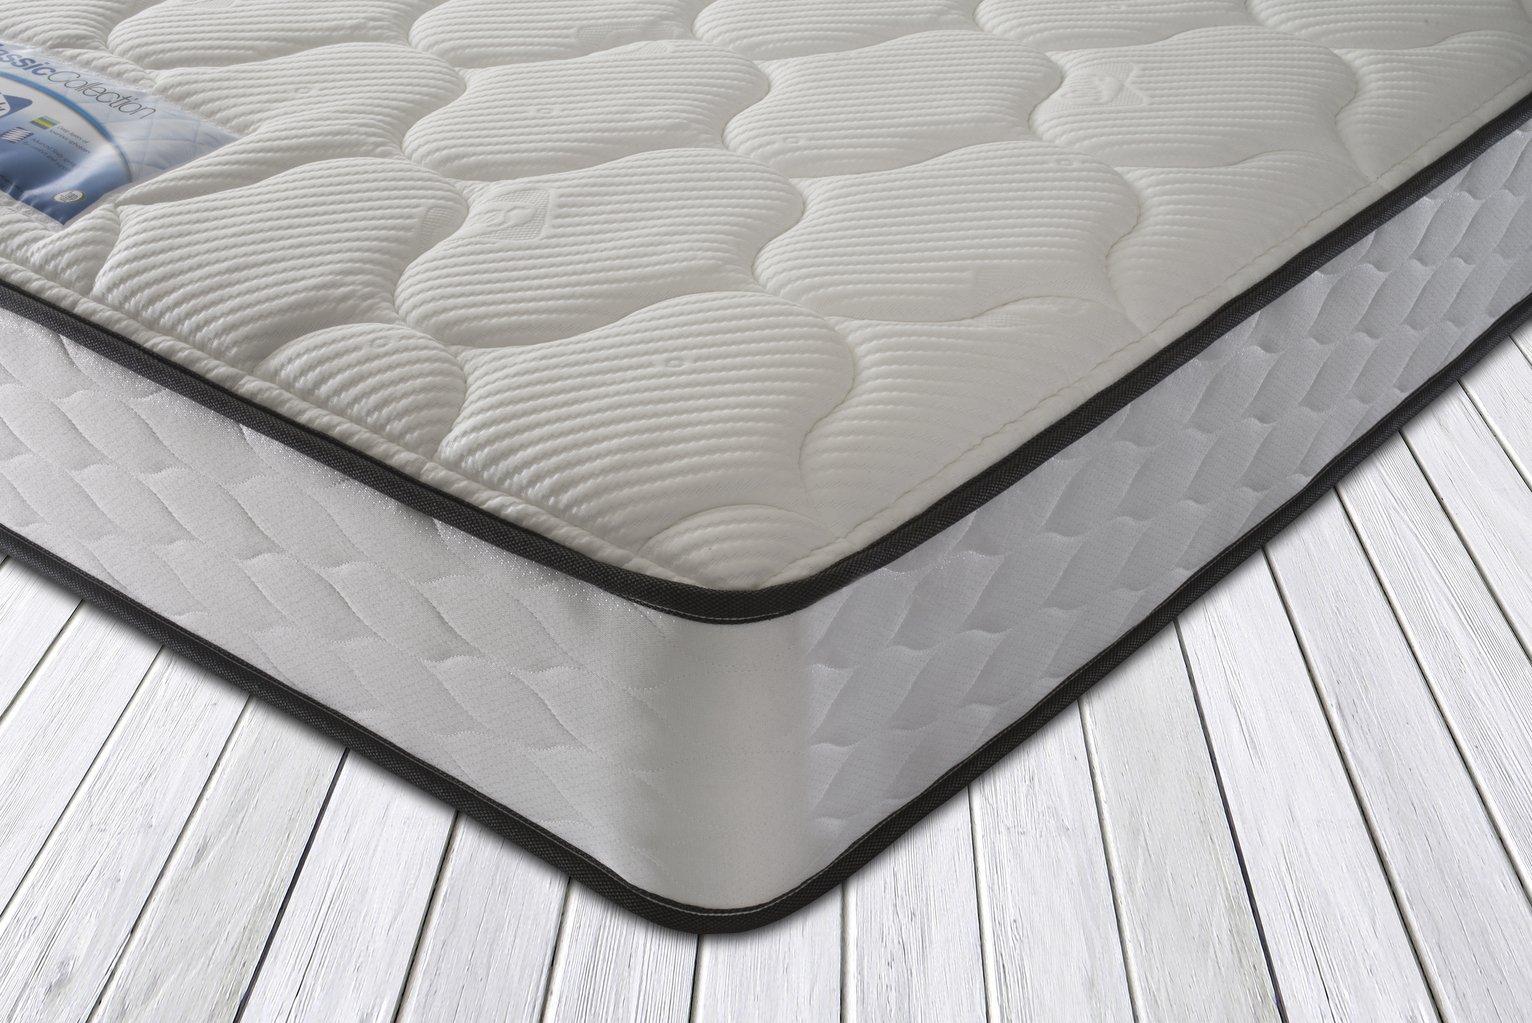 Sealy 1400 Pocket Sprung Micro Quilt Superking Mattress